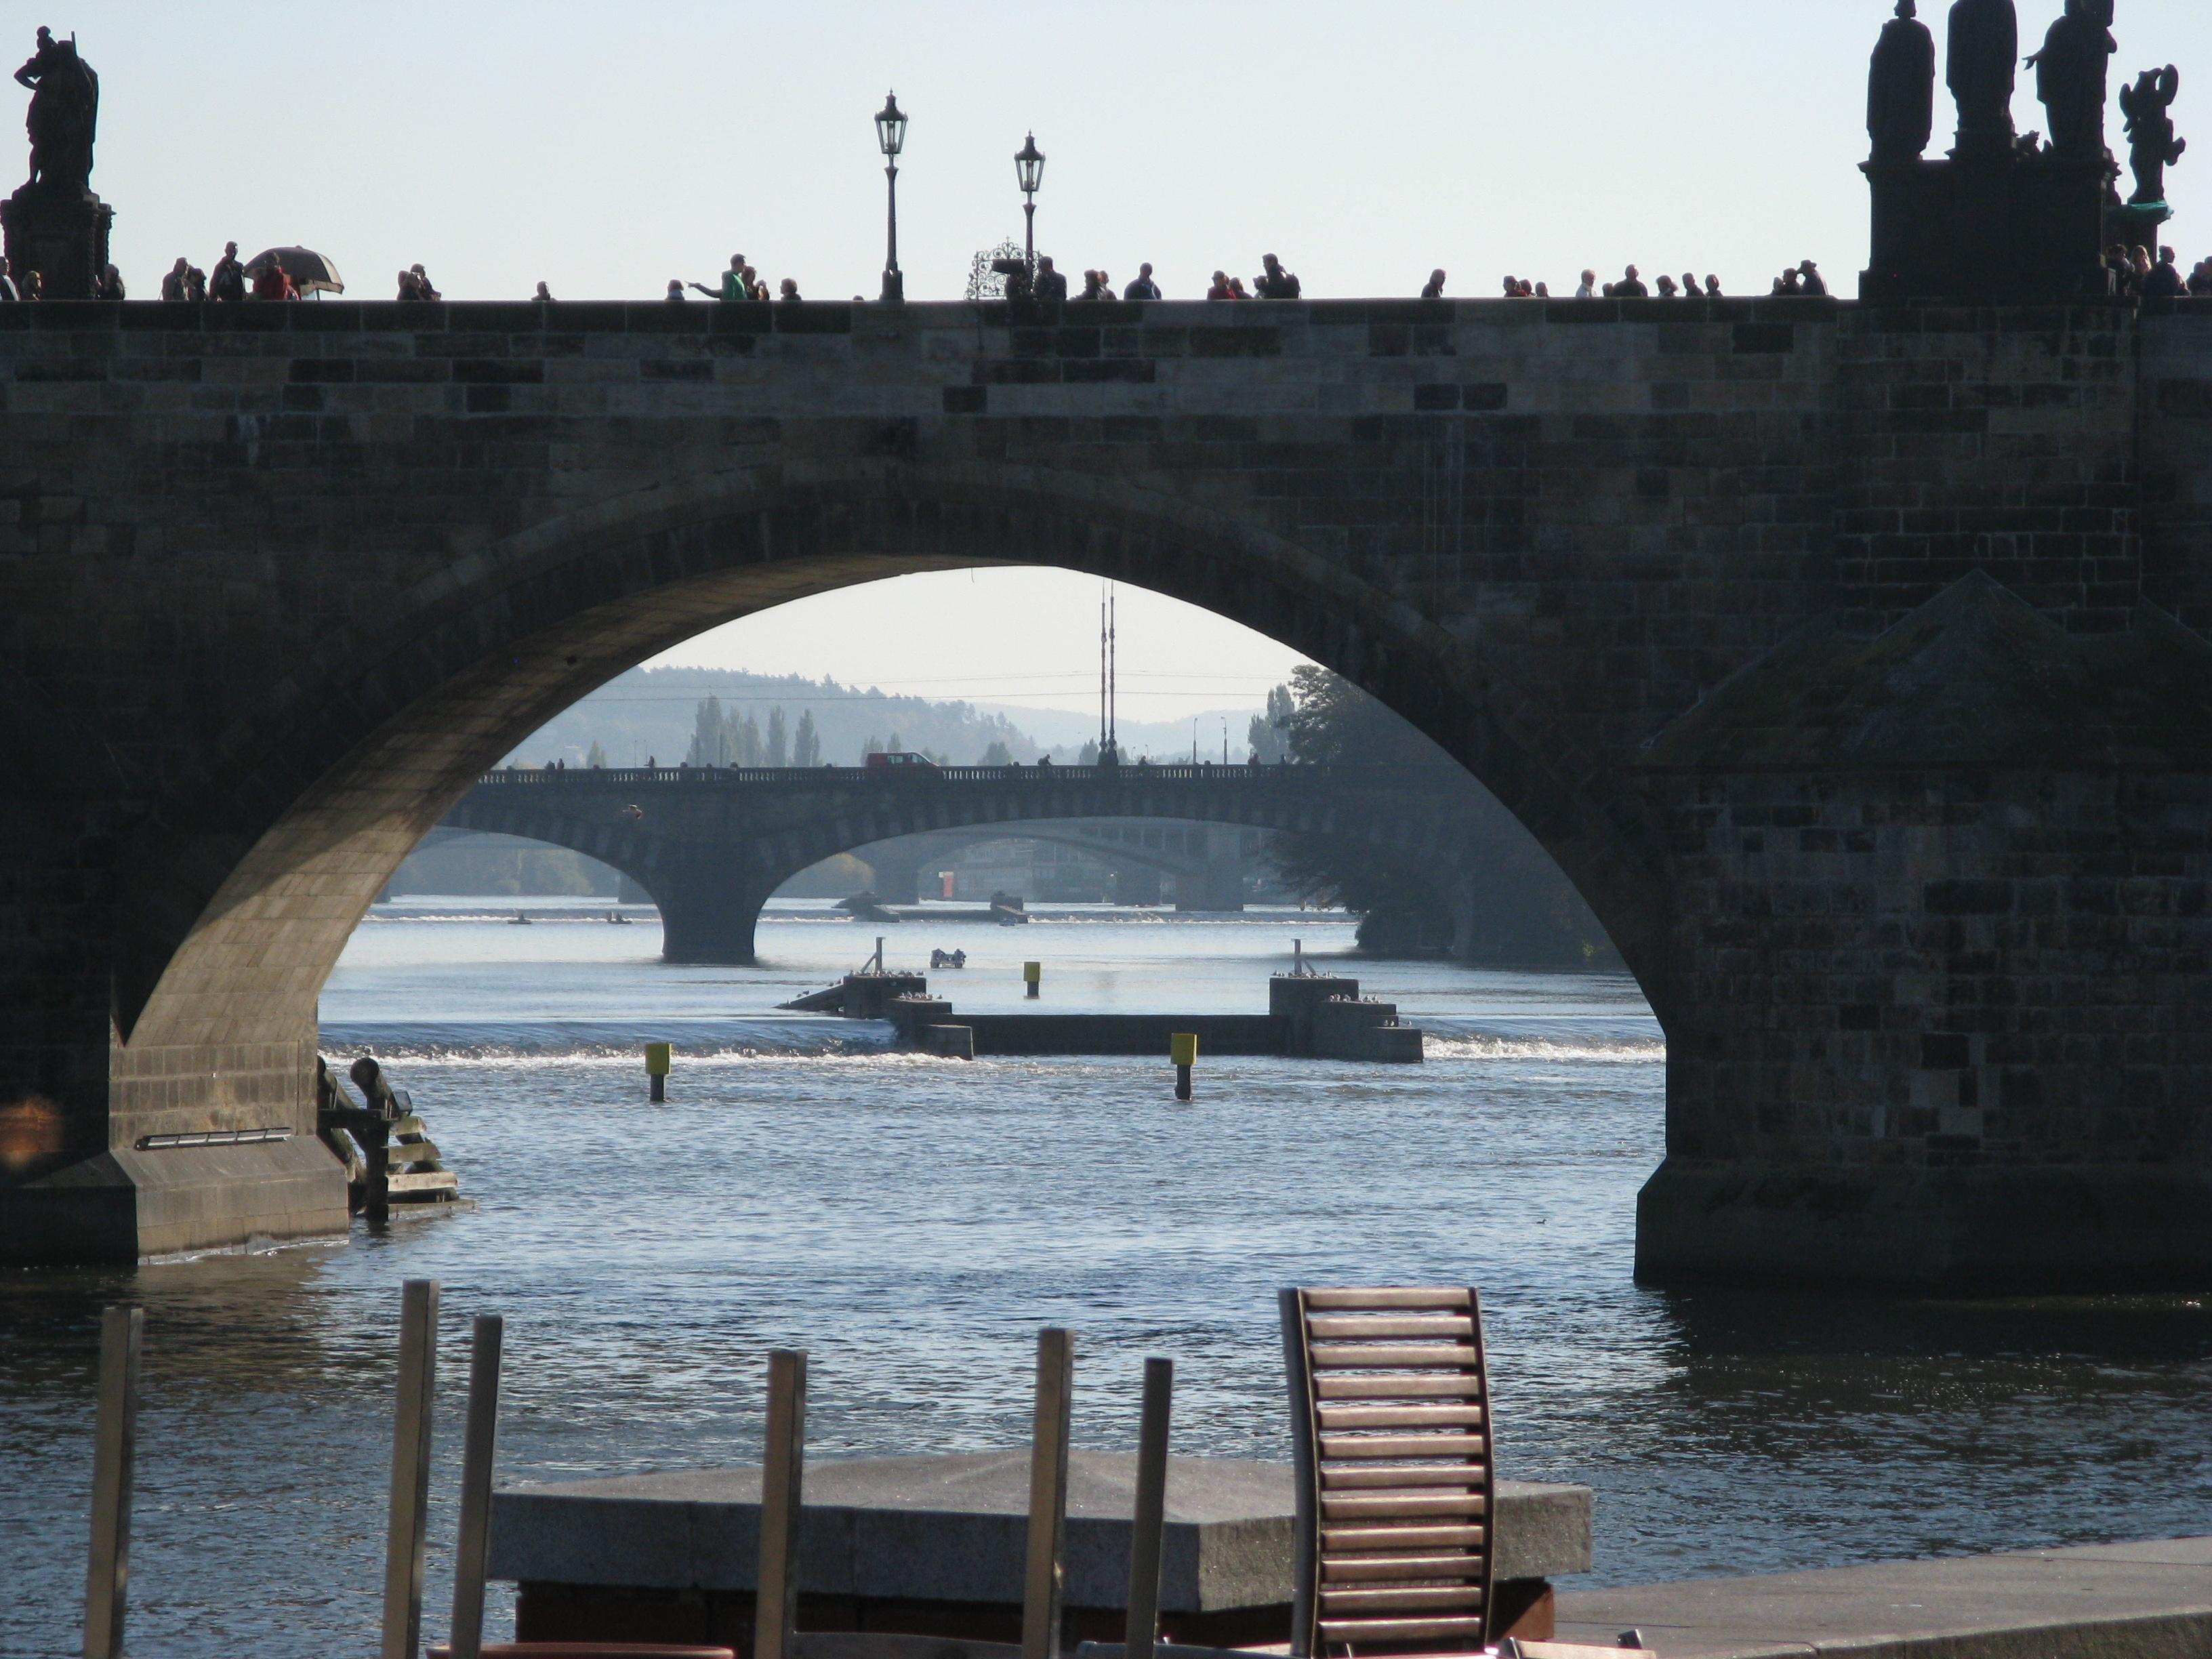 Description bridges in prague over vltava prague